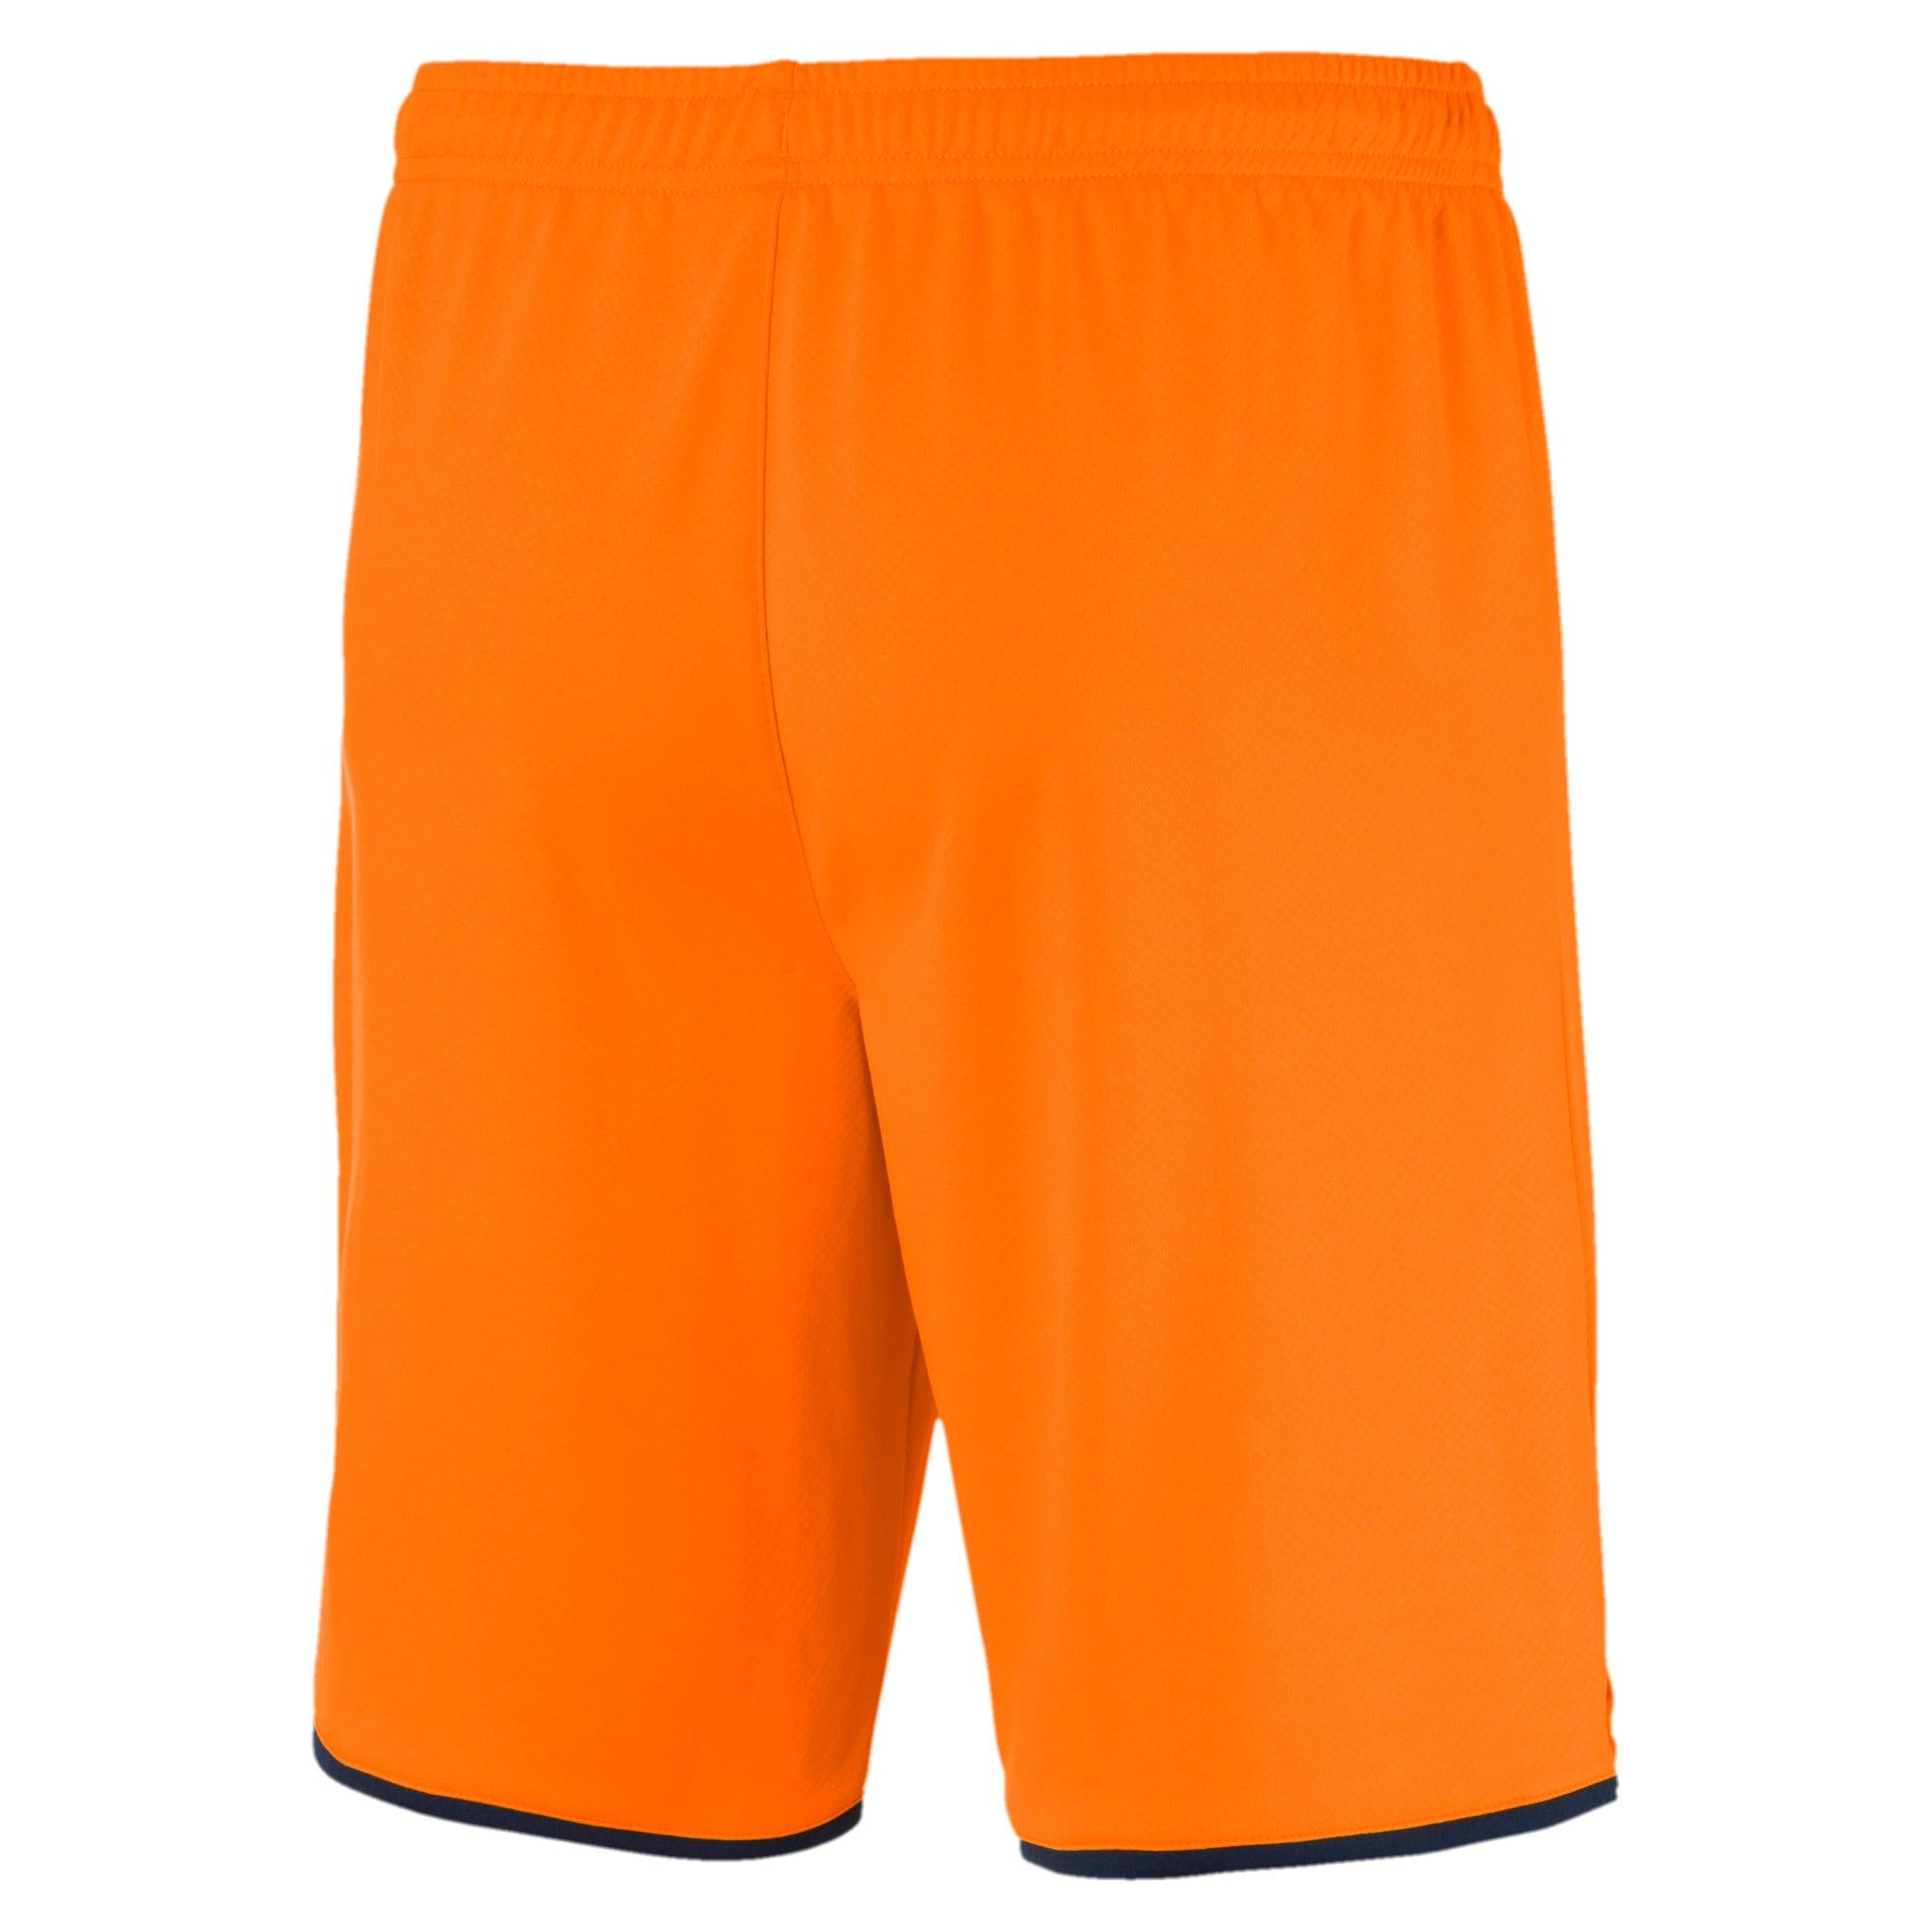 Thumbnail 2 of Newcastle United FC Men's Replica Shorts, Vibrant Orange-Peacoat, medium